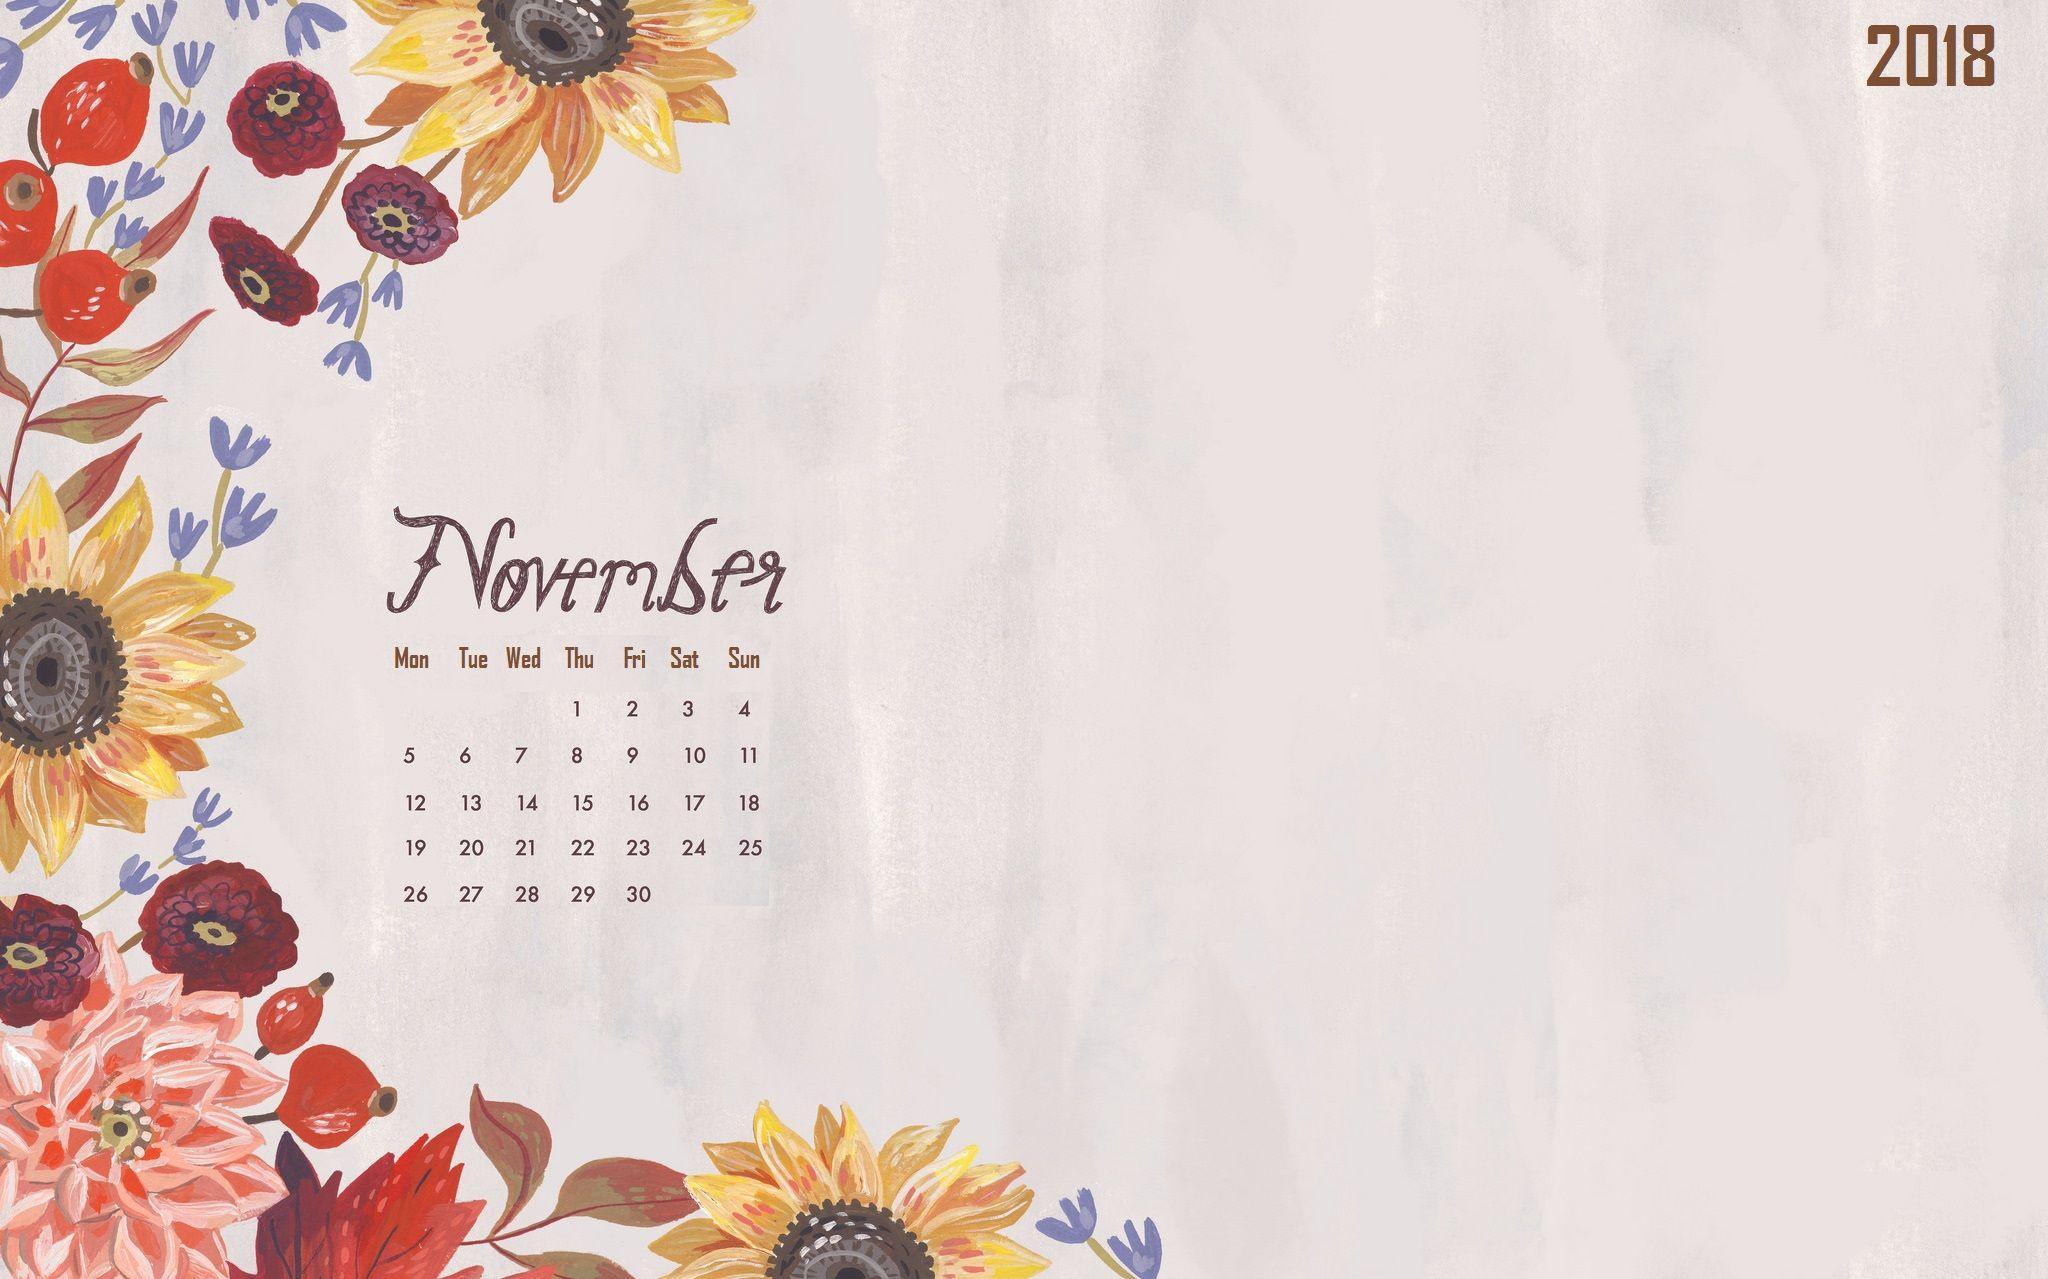 Floral November 2018 Calendar Wallpaper Calendar